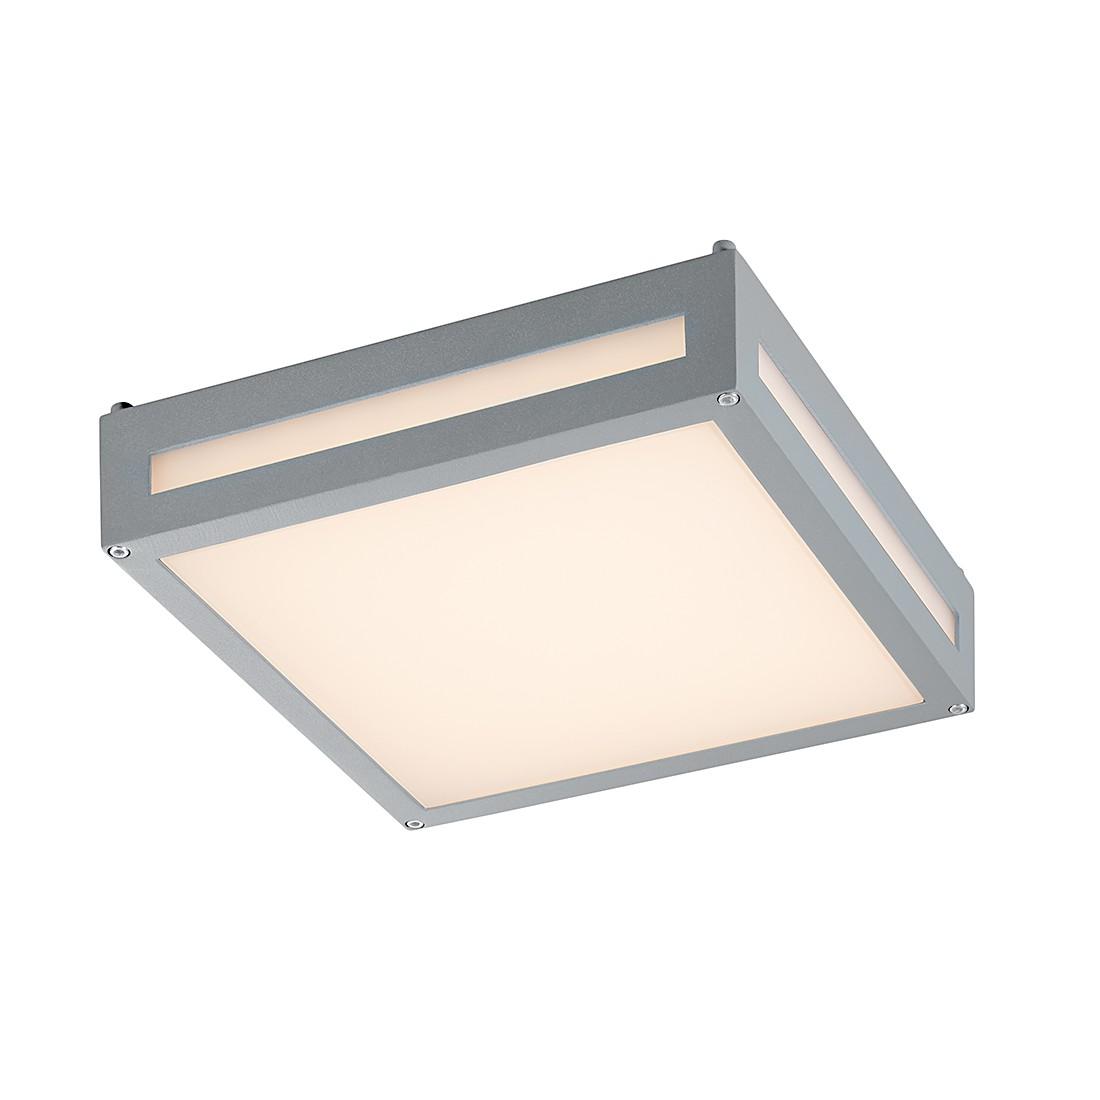 EEK A+, LED-Außenleuchte Newa 1-flammig - Aluminium Kunststoff - Silber, Trio